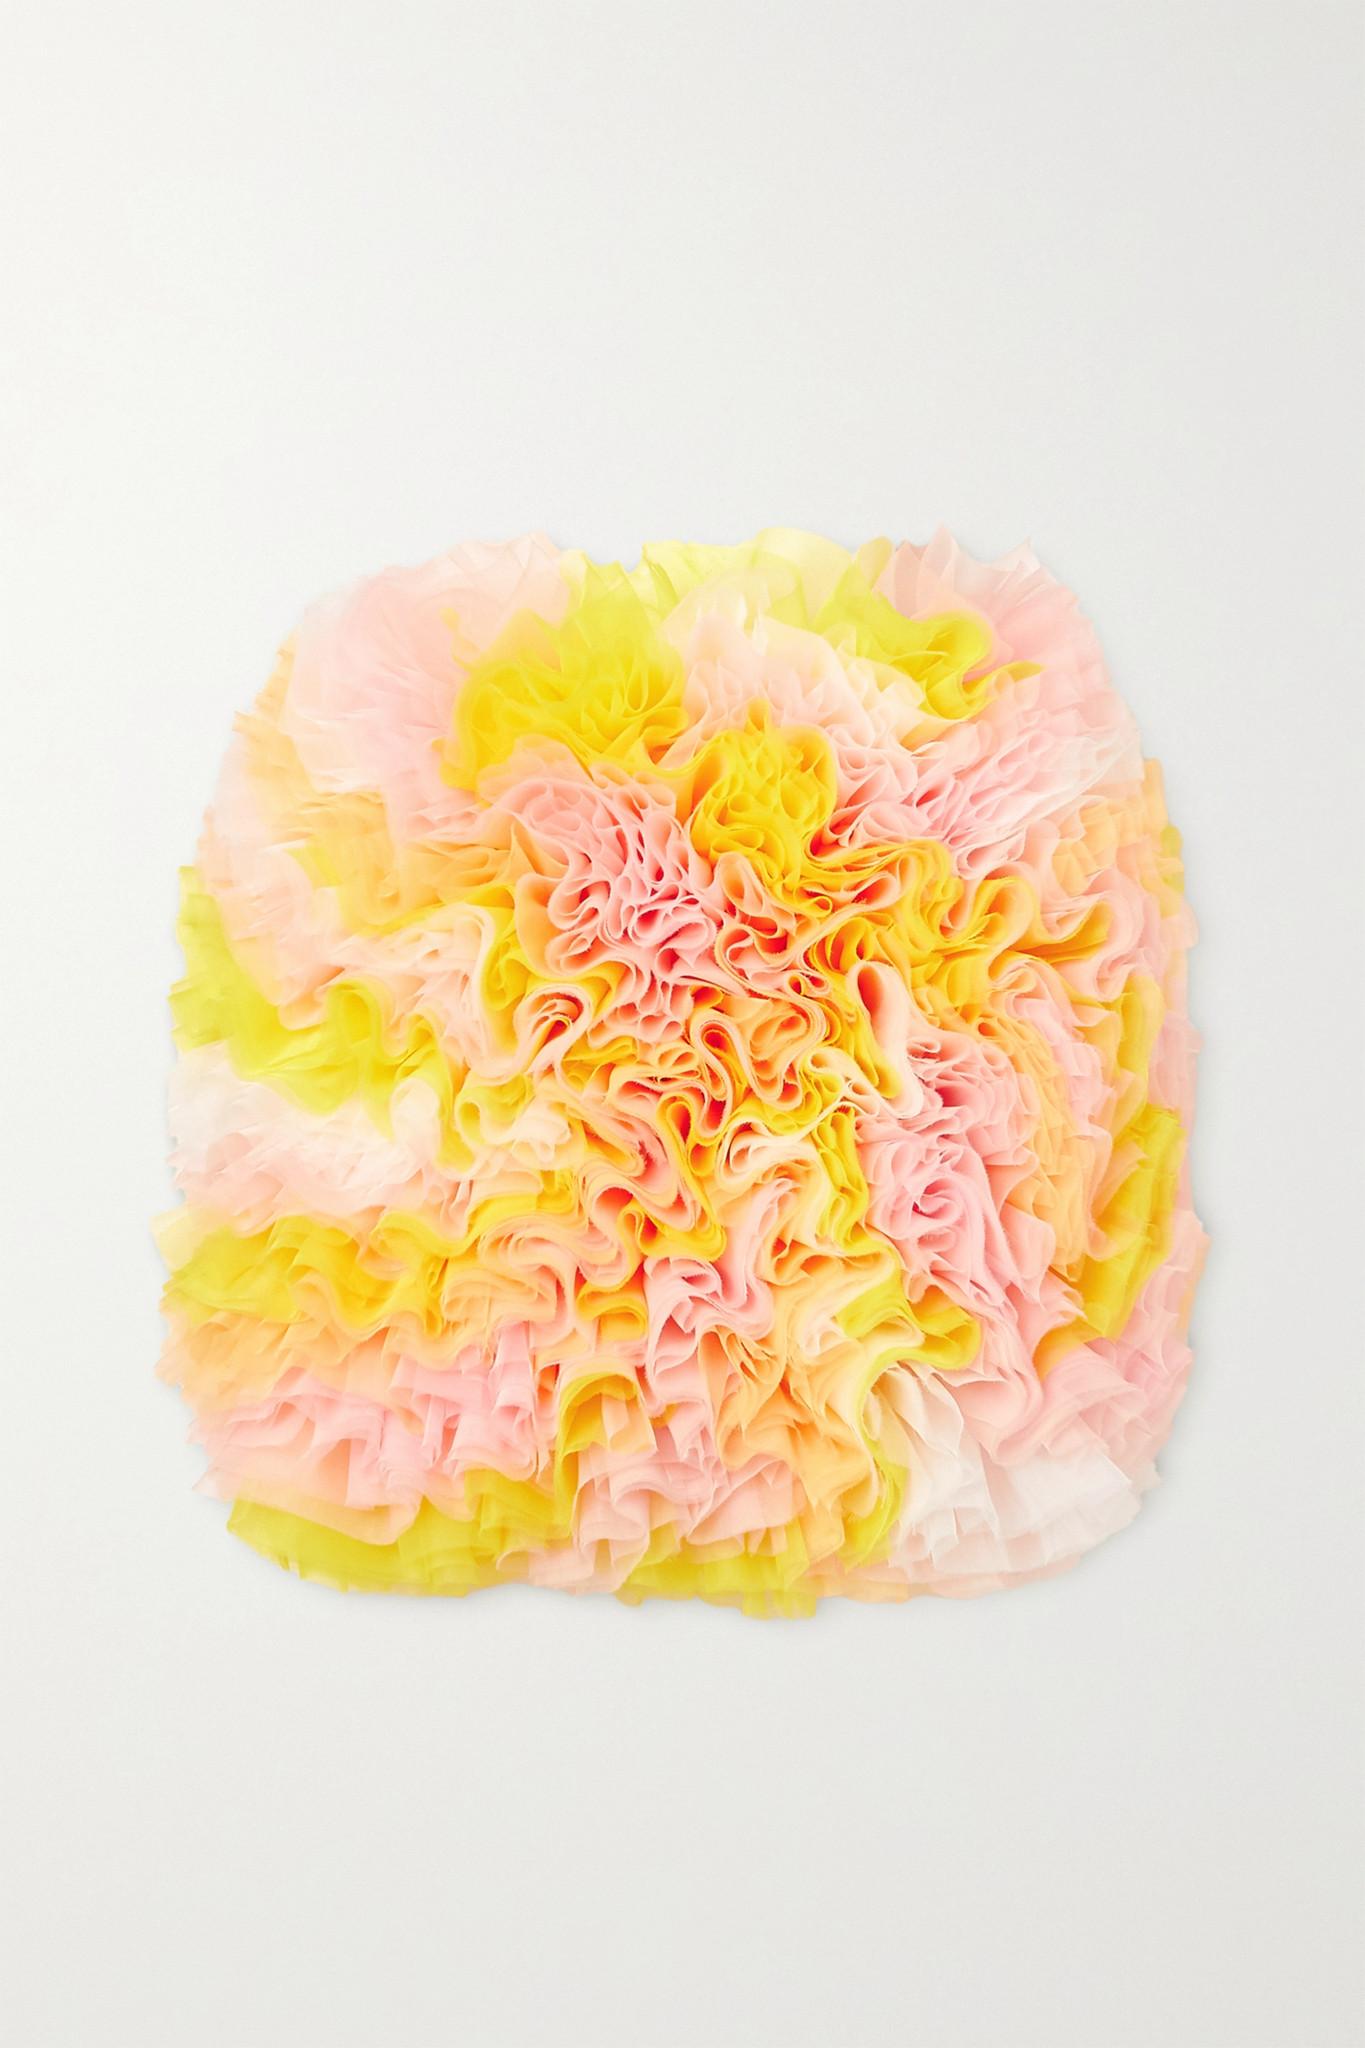 TOMO KOIZUMI X EMILIO PUCCI - Ruffled Tulle Skirt - Yellow - IT40